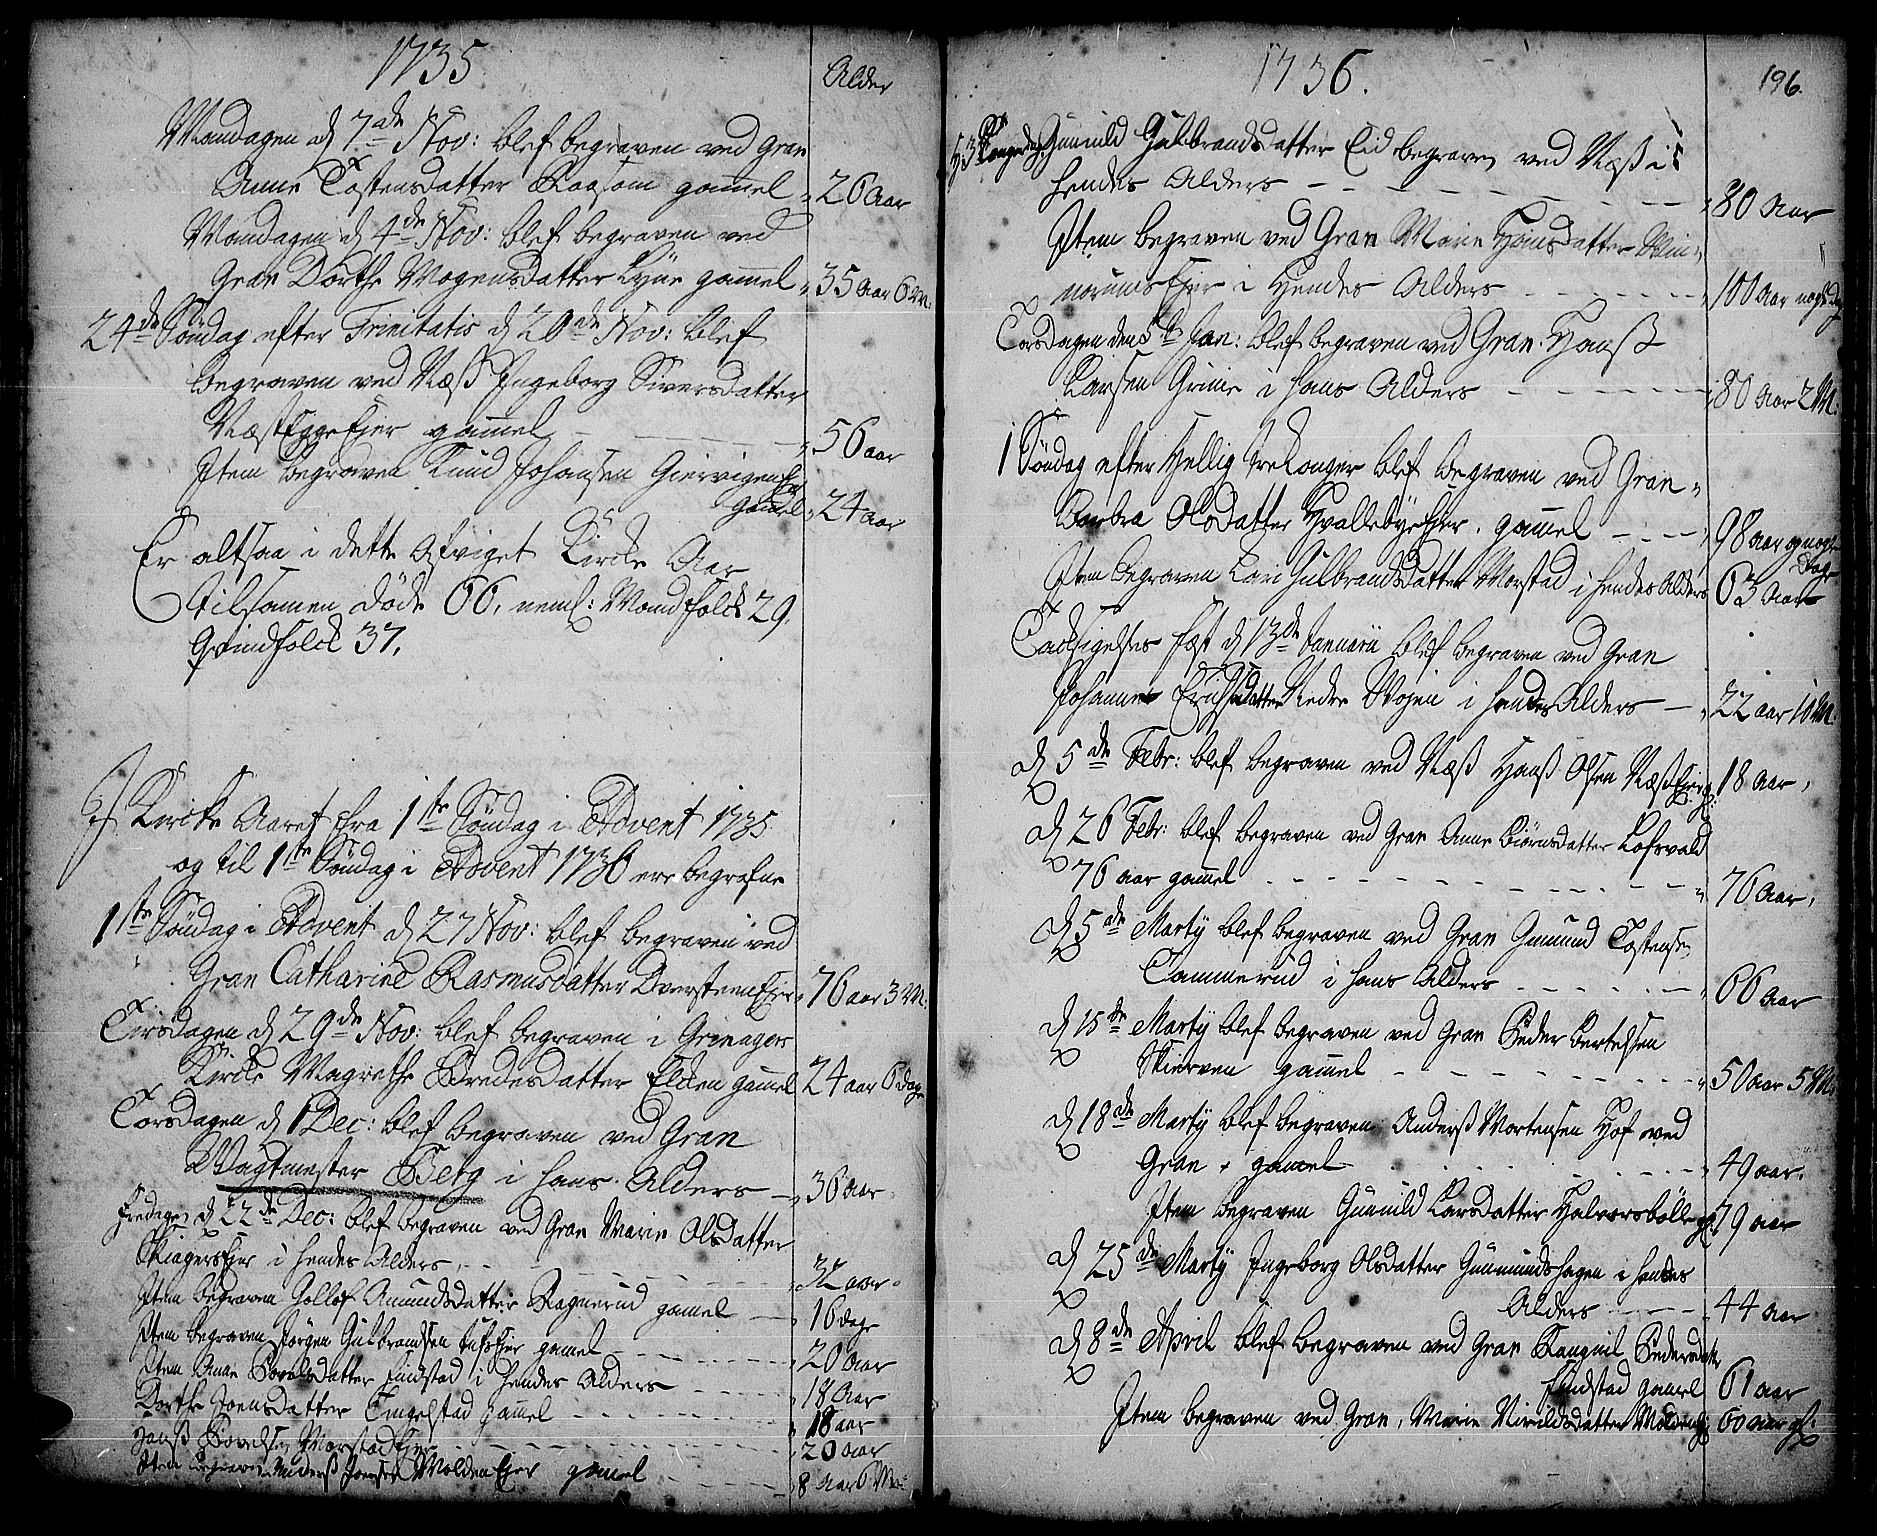 SAH, Gran prestekontor, Ministerialbok nr. 2, 1732-1744, s. 196